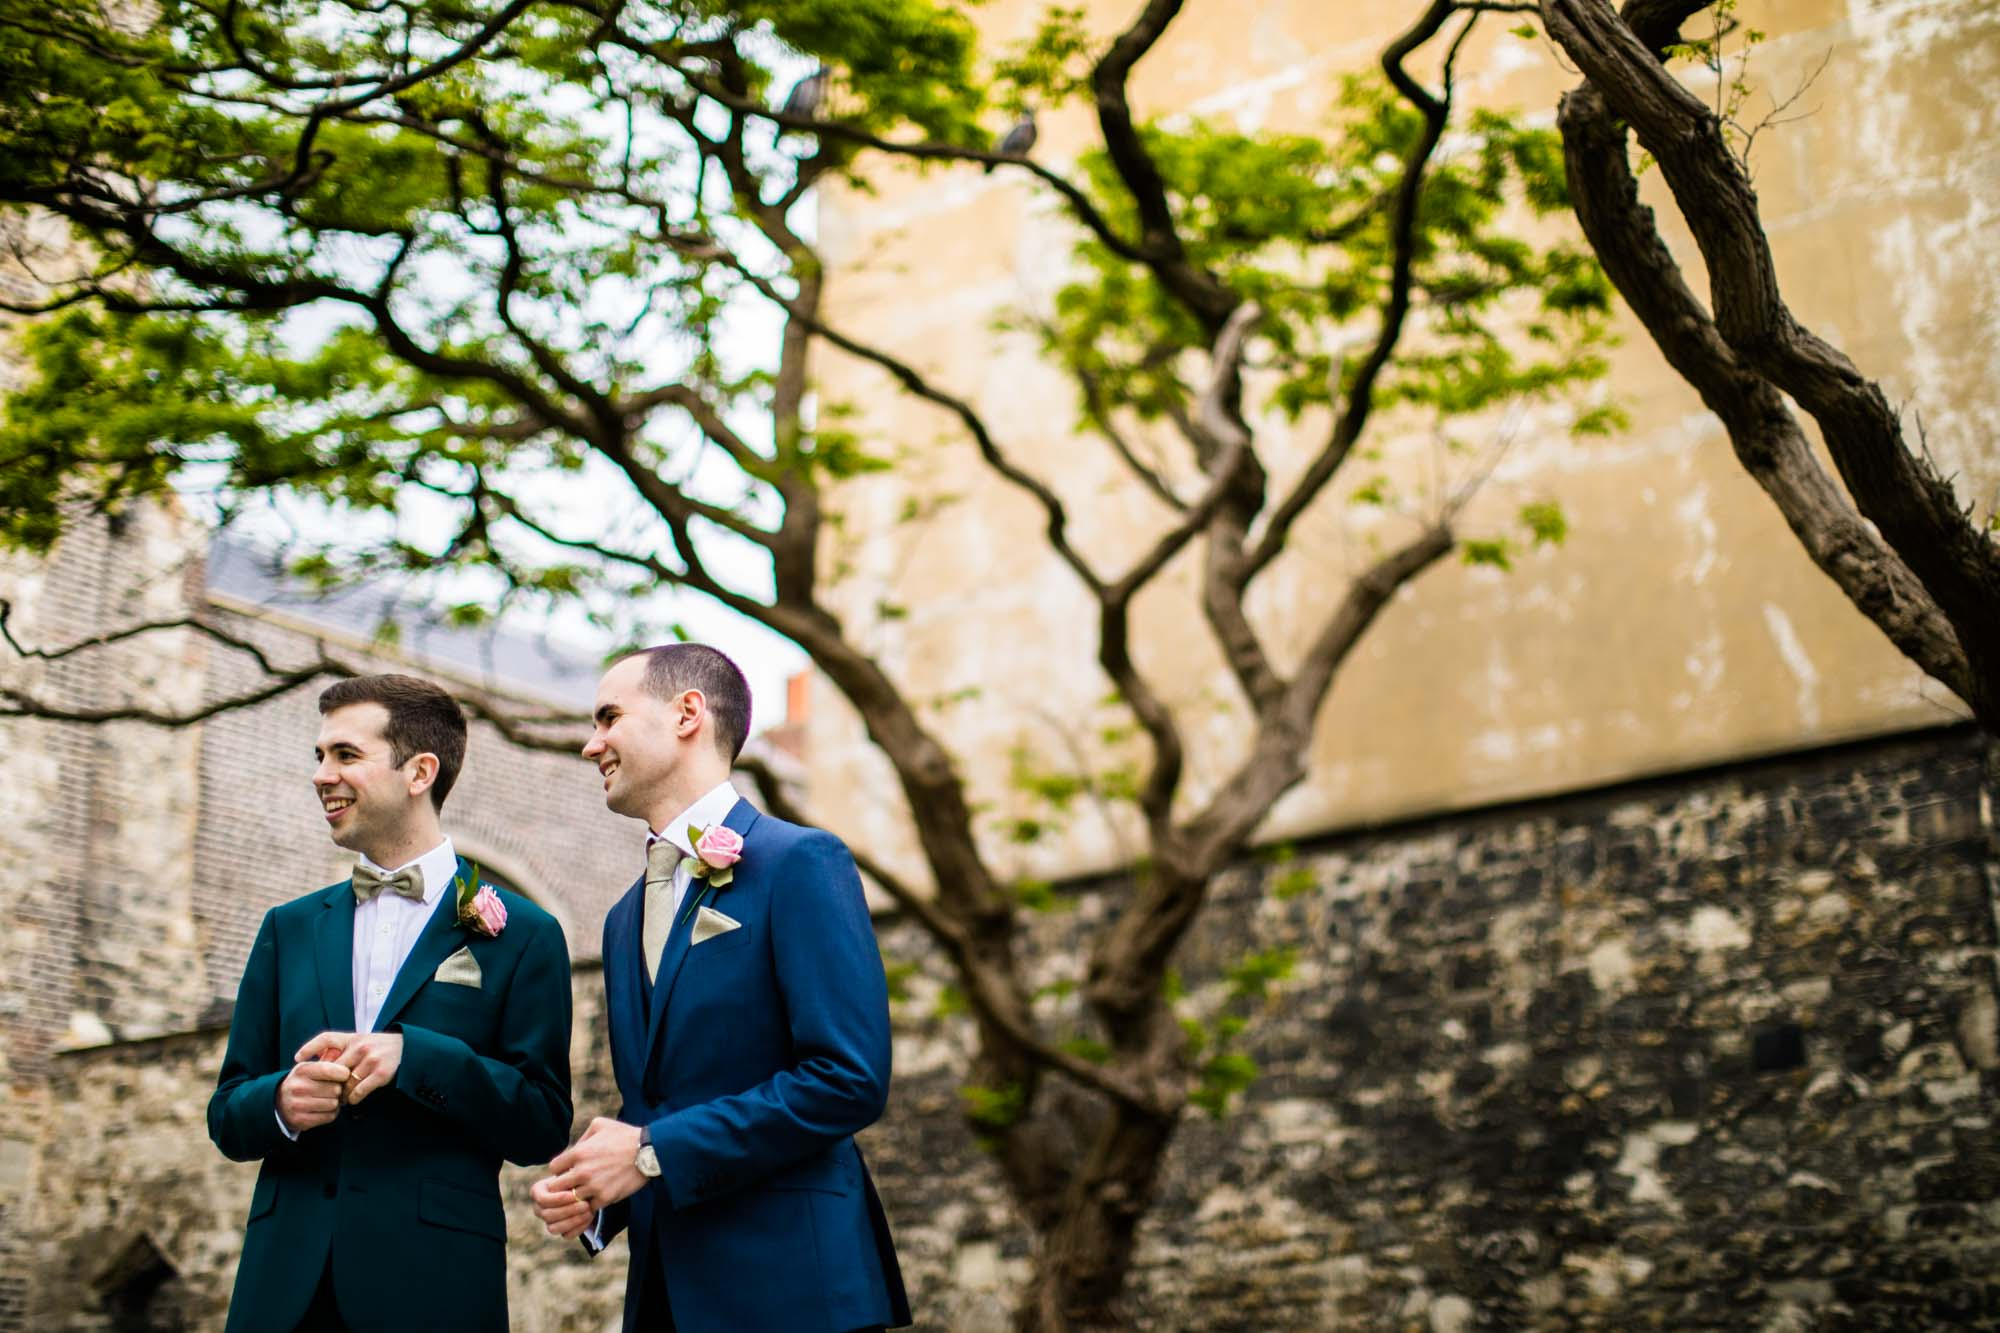 Malmaison London Colourful Wedding Photos